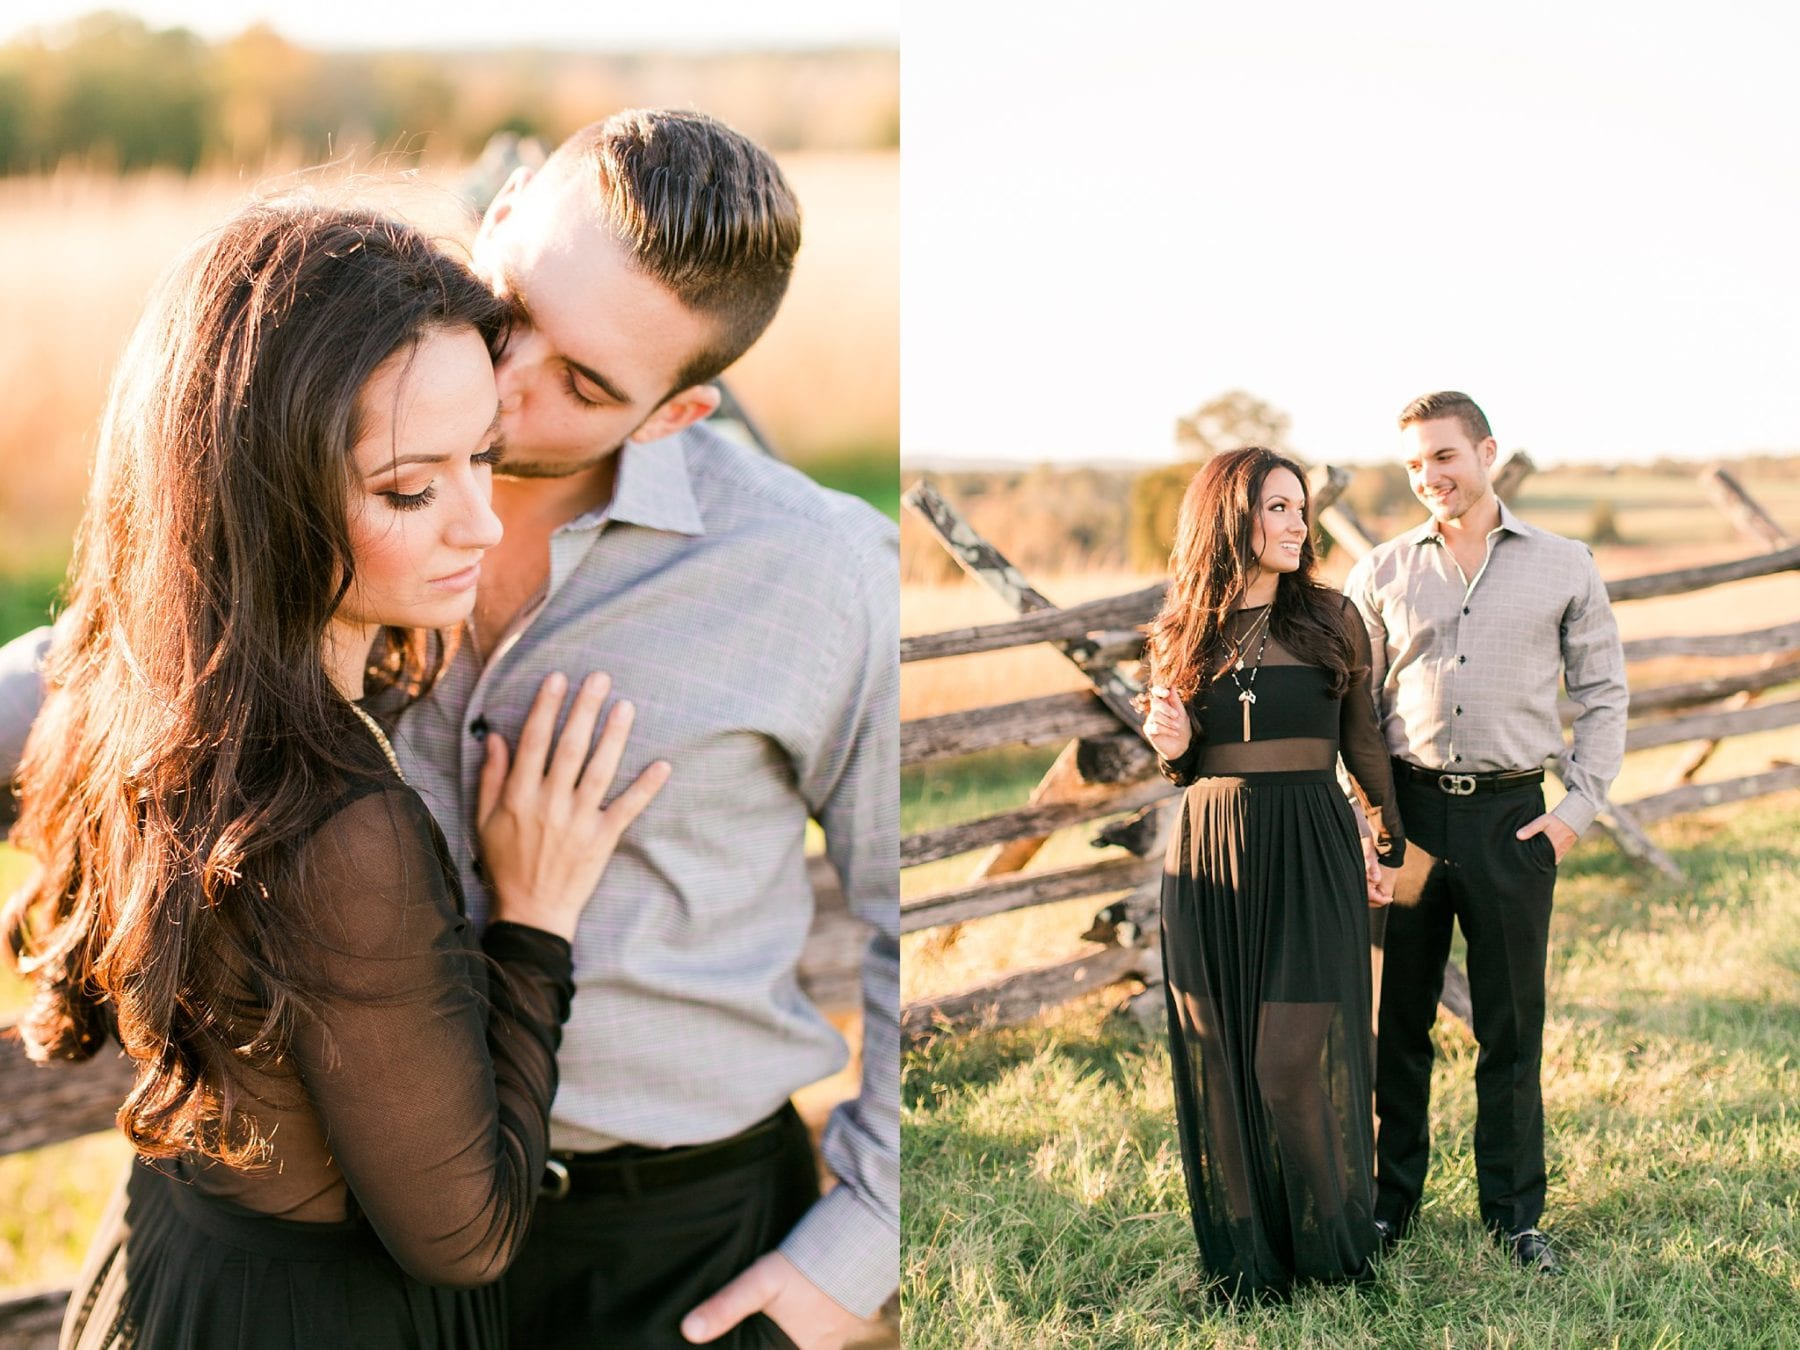 Manassas Battlefield Portraits Virginia Wedding Photographer Megan Kelsey Photography Lianne & Chris-112.jpg